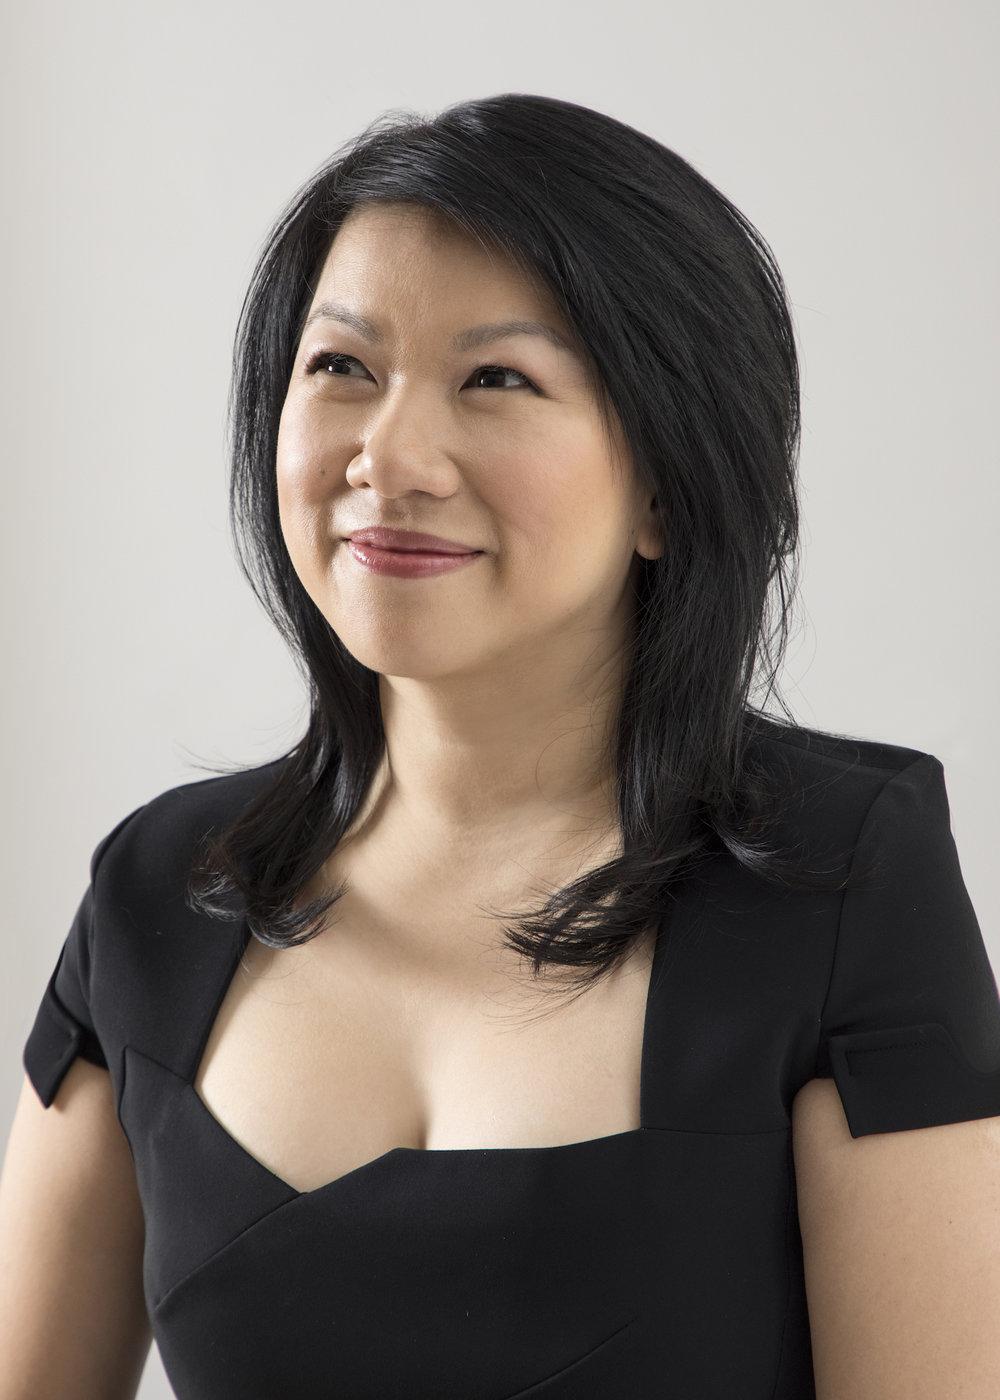 Copy of Shan-Lyn Ma, Co-Founder, ZOLA